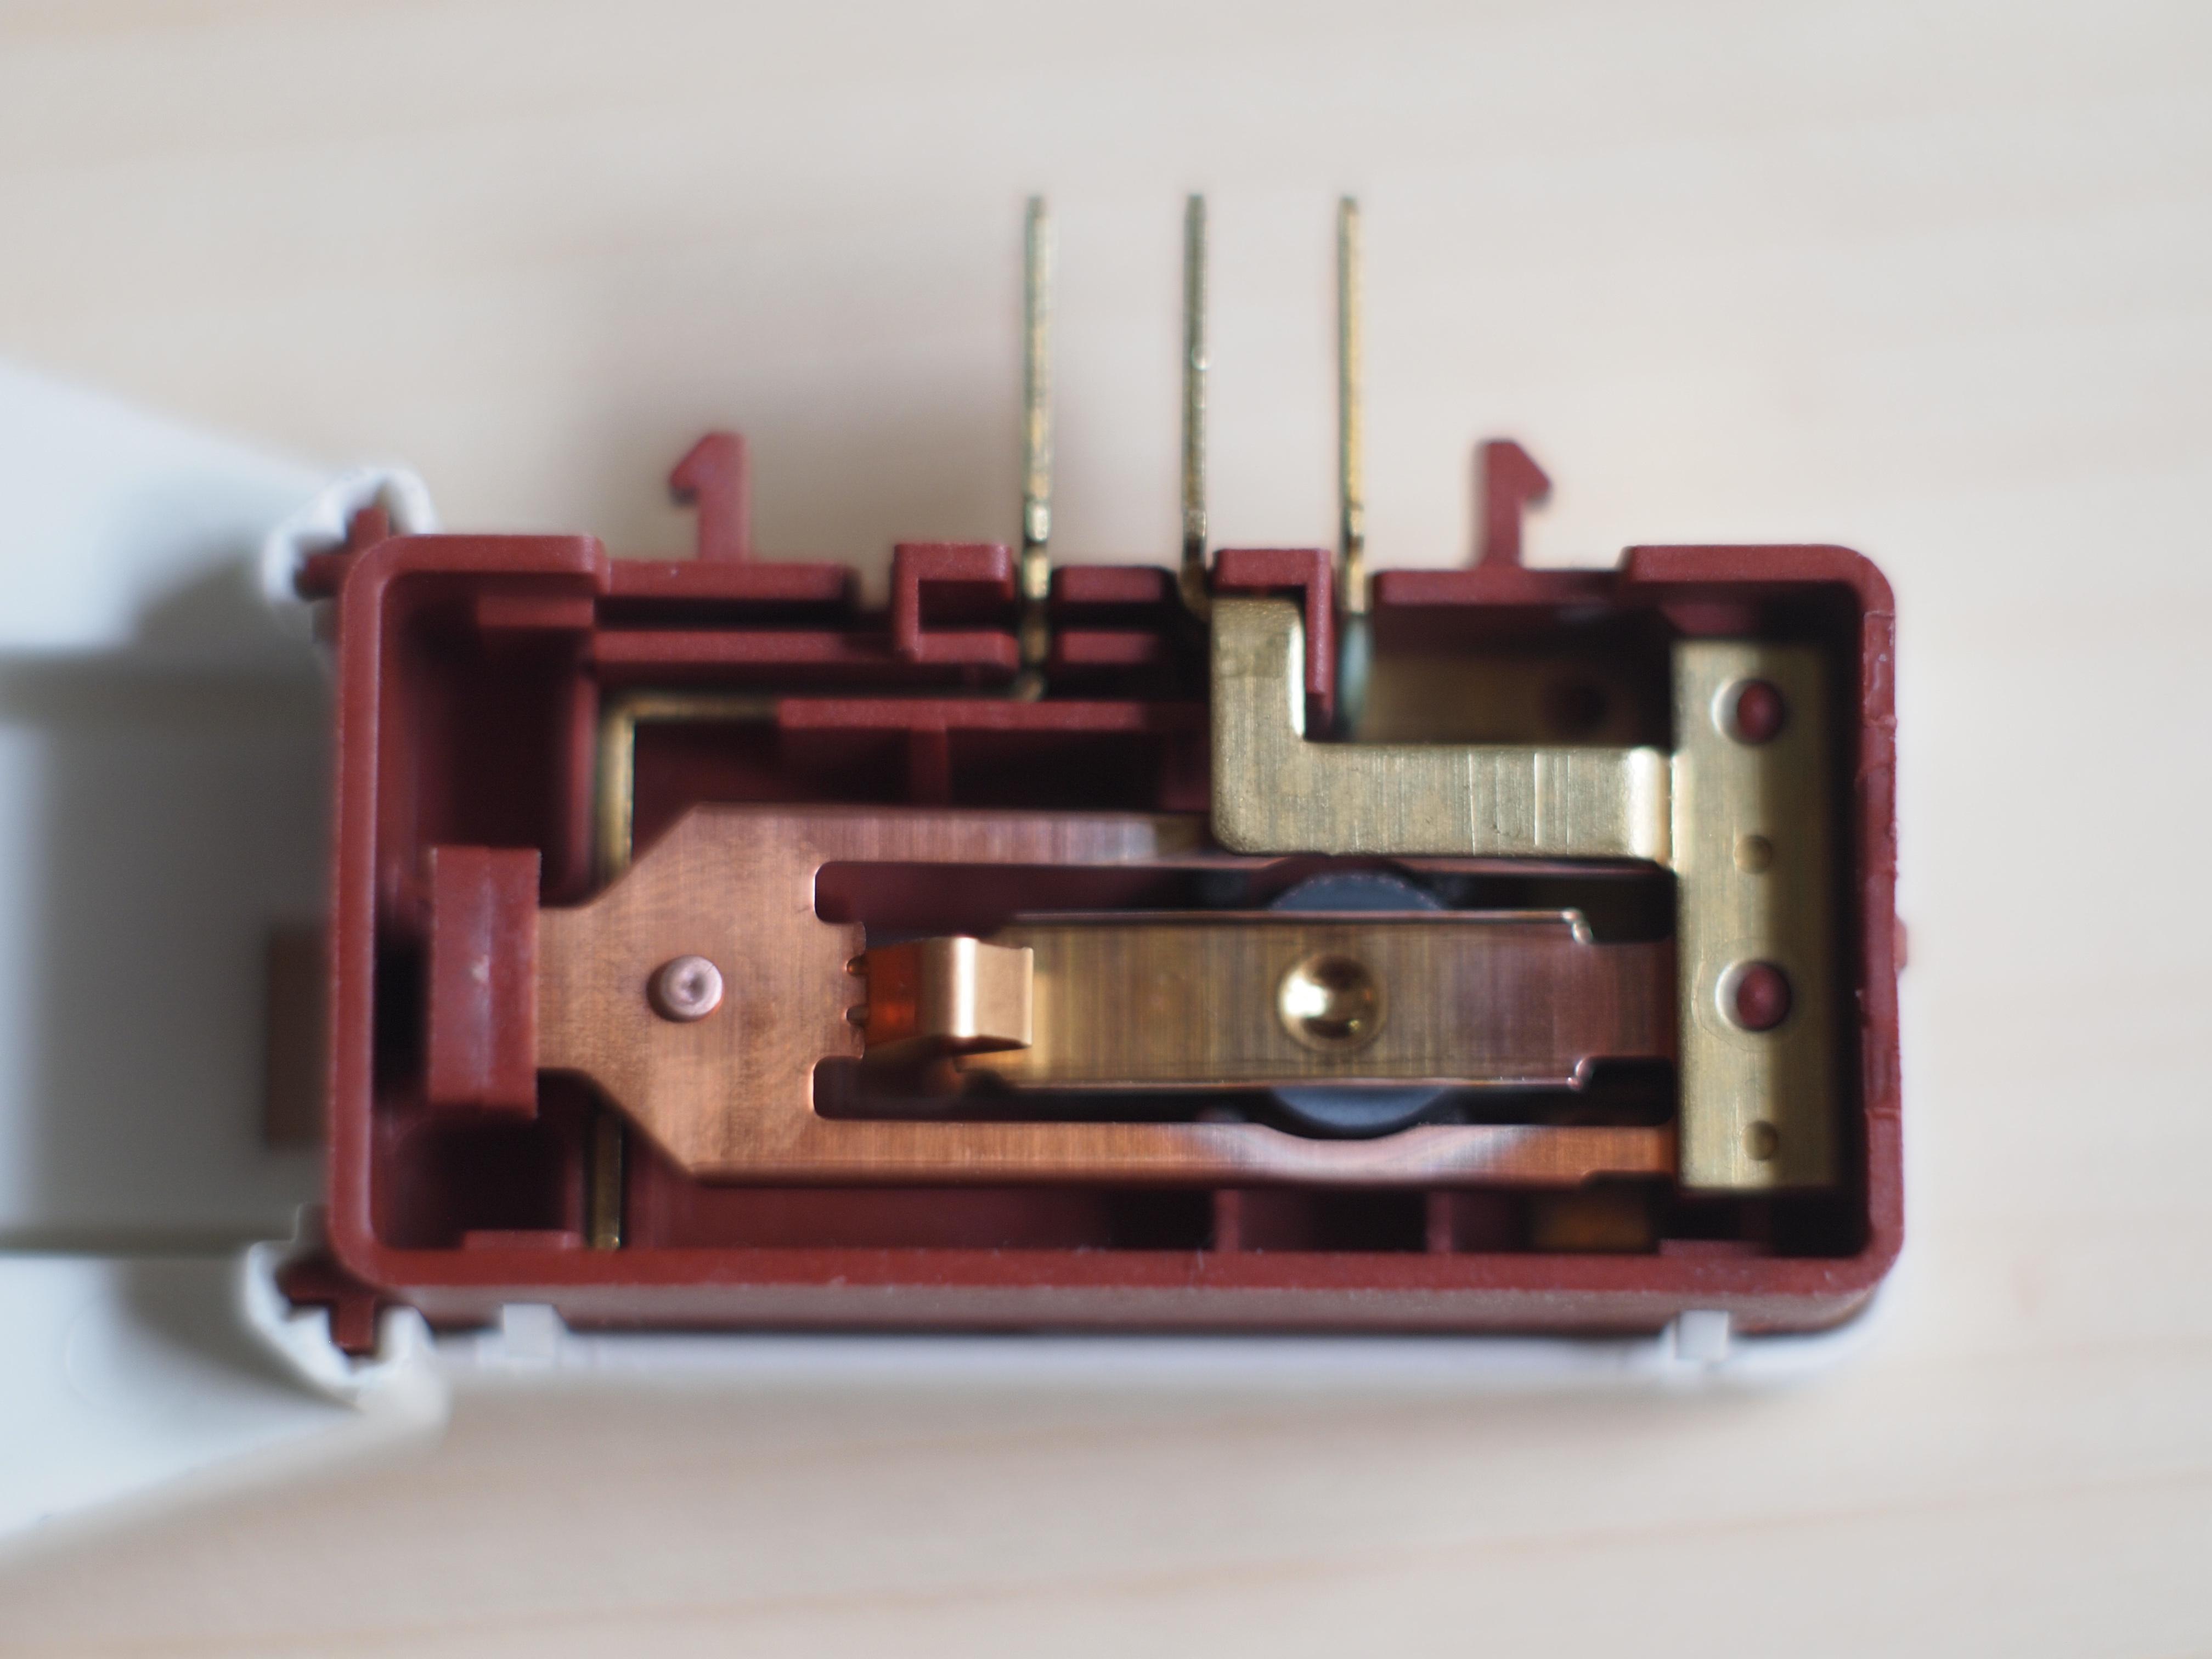 whirlpool washer parts diagram ceiling fan wiring single switch repairing door interlock metalflex zv-446 - ifixit repair guide